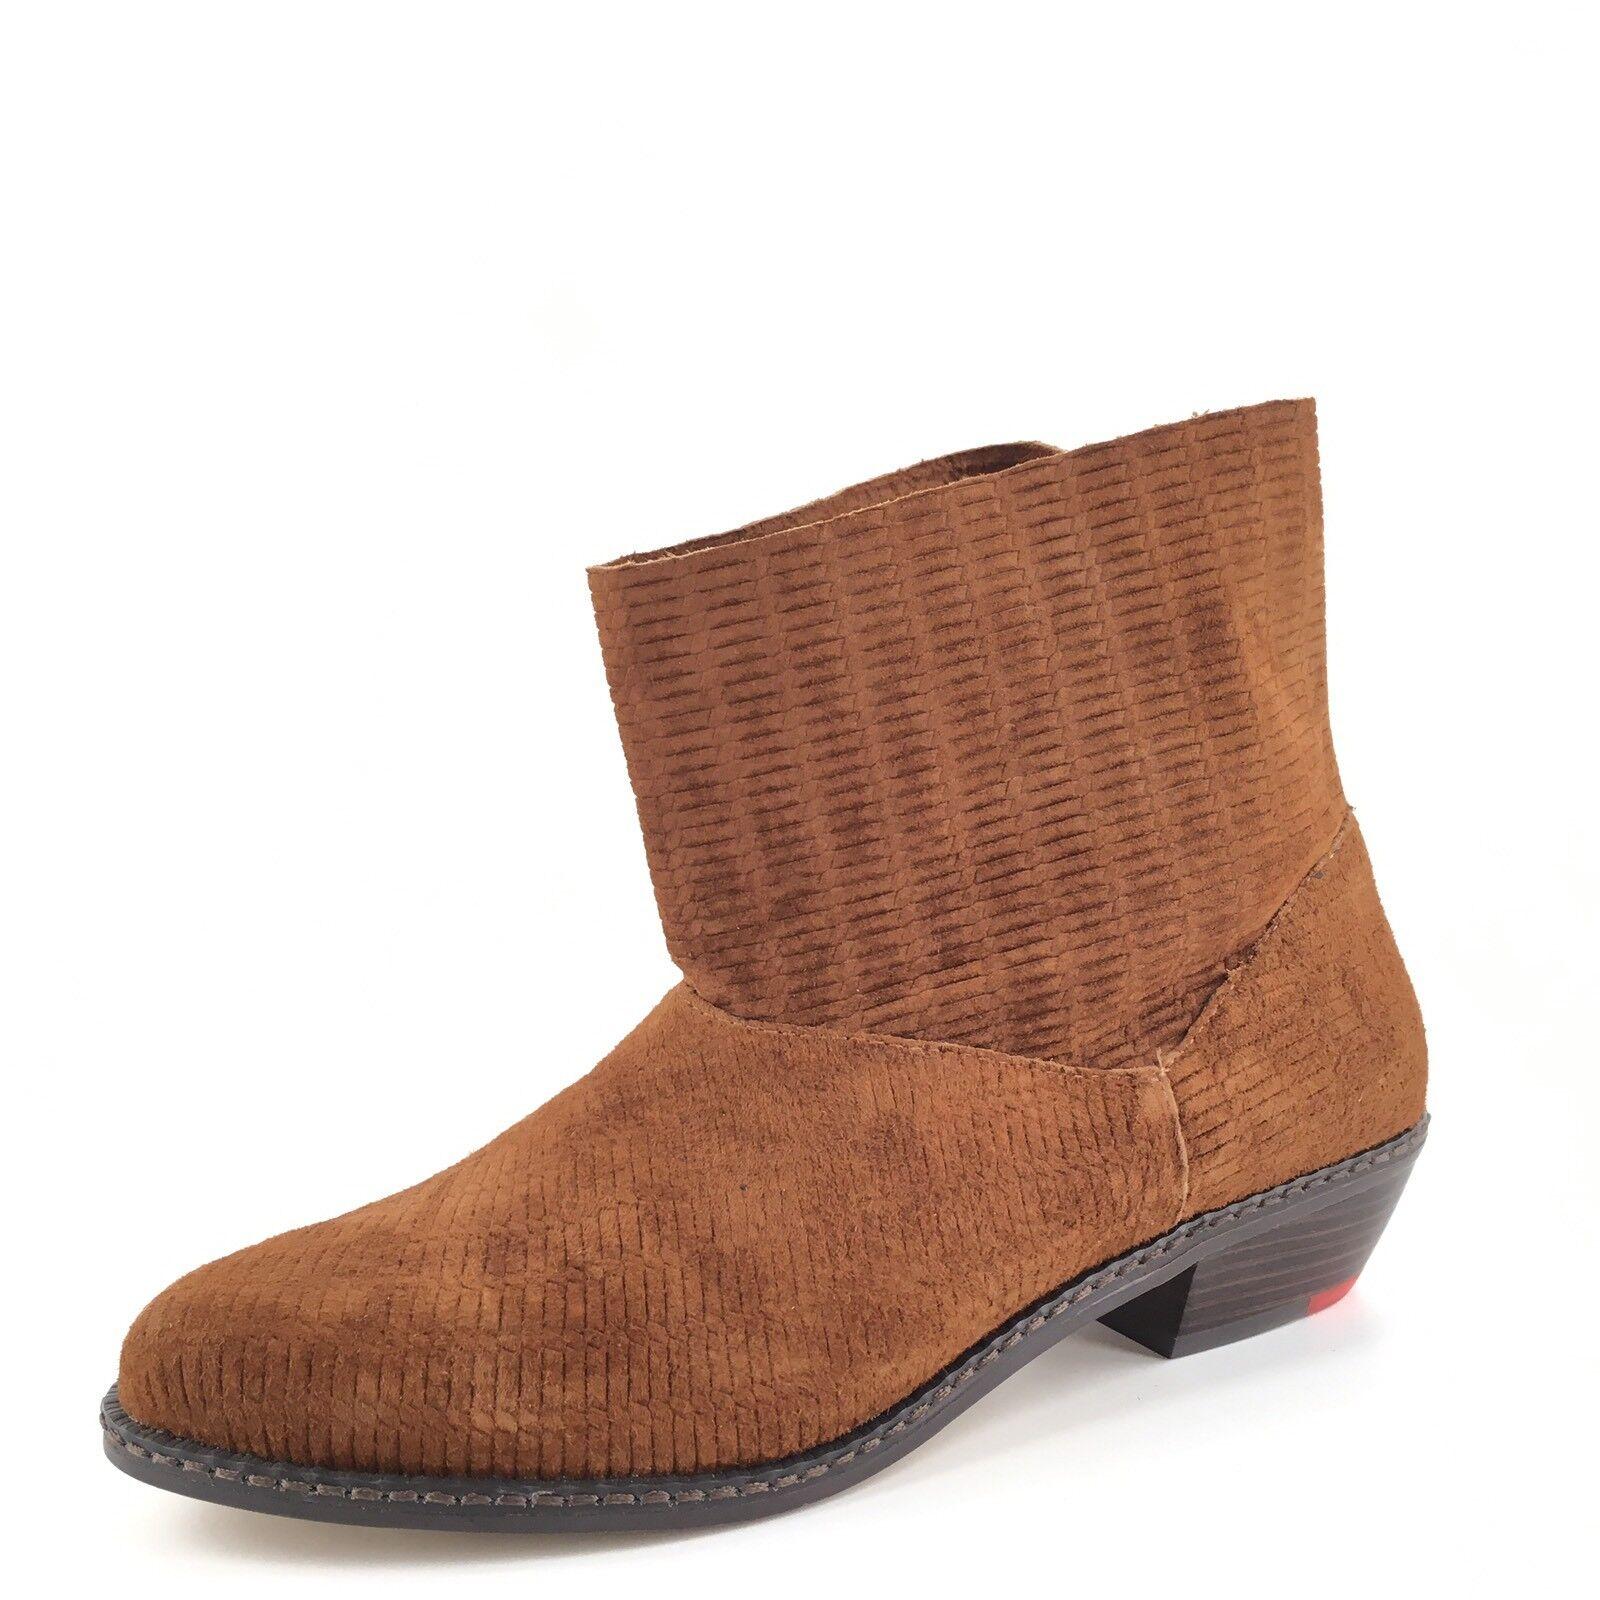 Joe's Jeans Star II Chestnut Brown Short Boots Women's Size 6.5 M